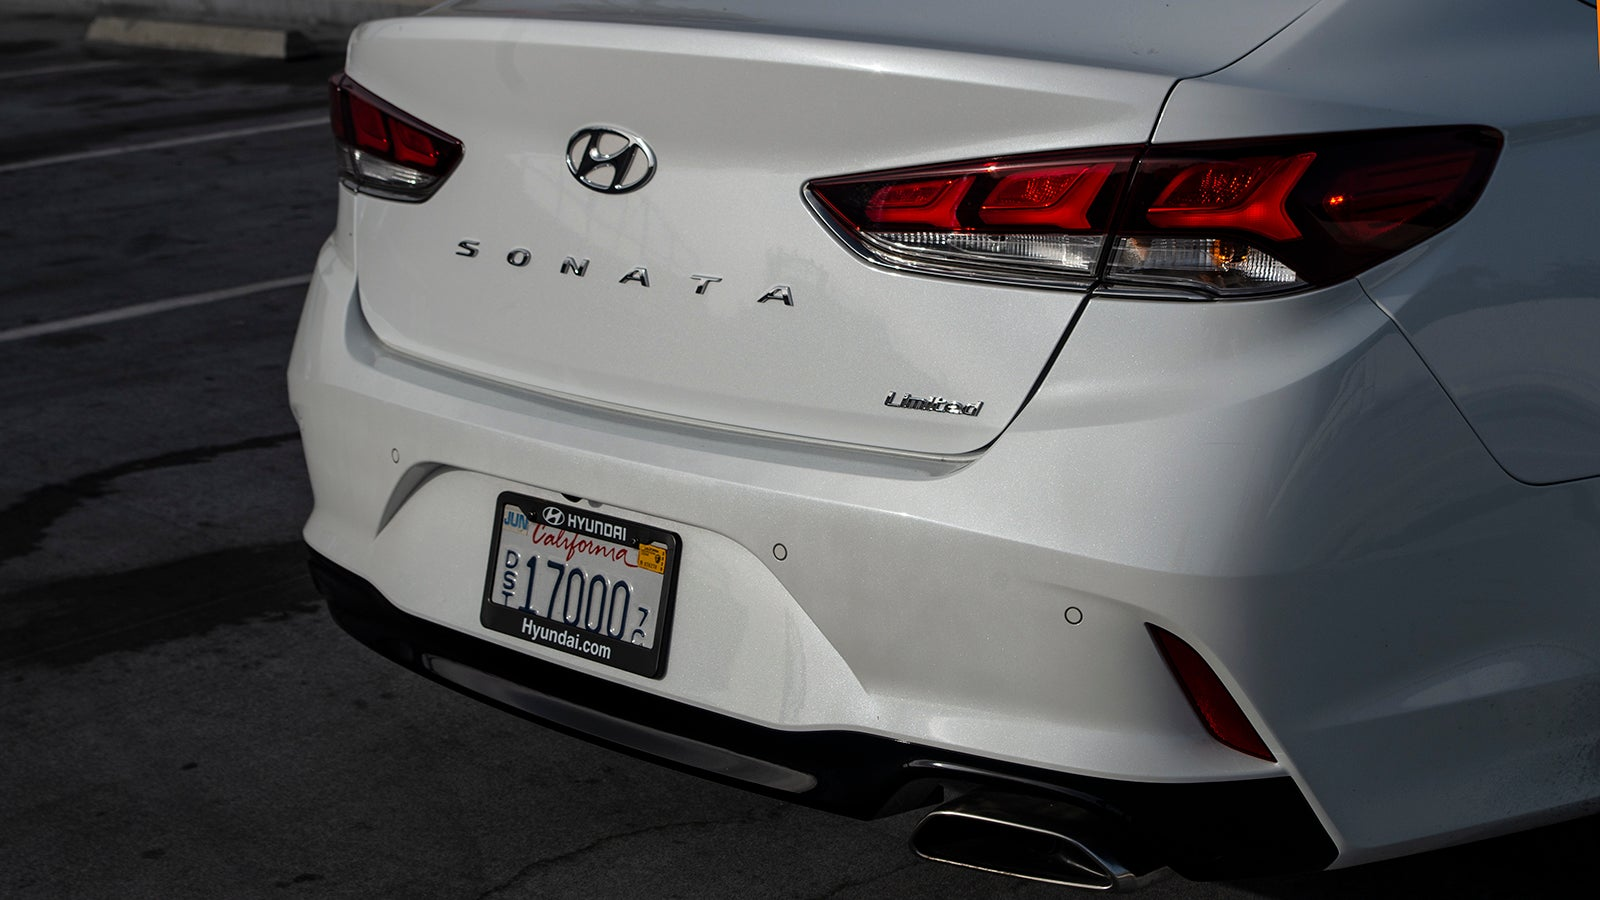 The 2018 Hyundai Sonata Is The Most User Friendly Car I've Driven